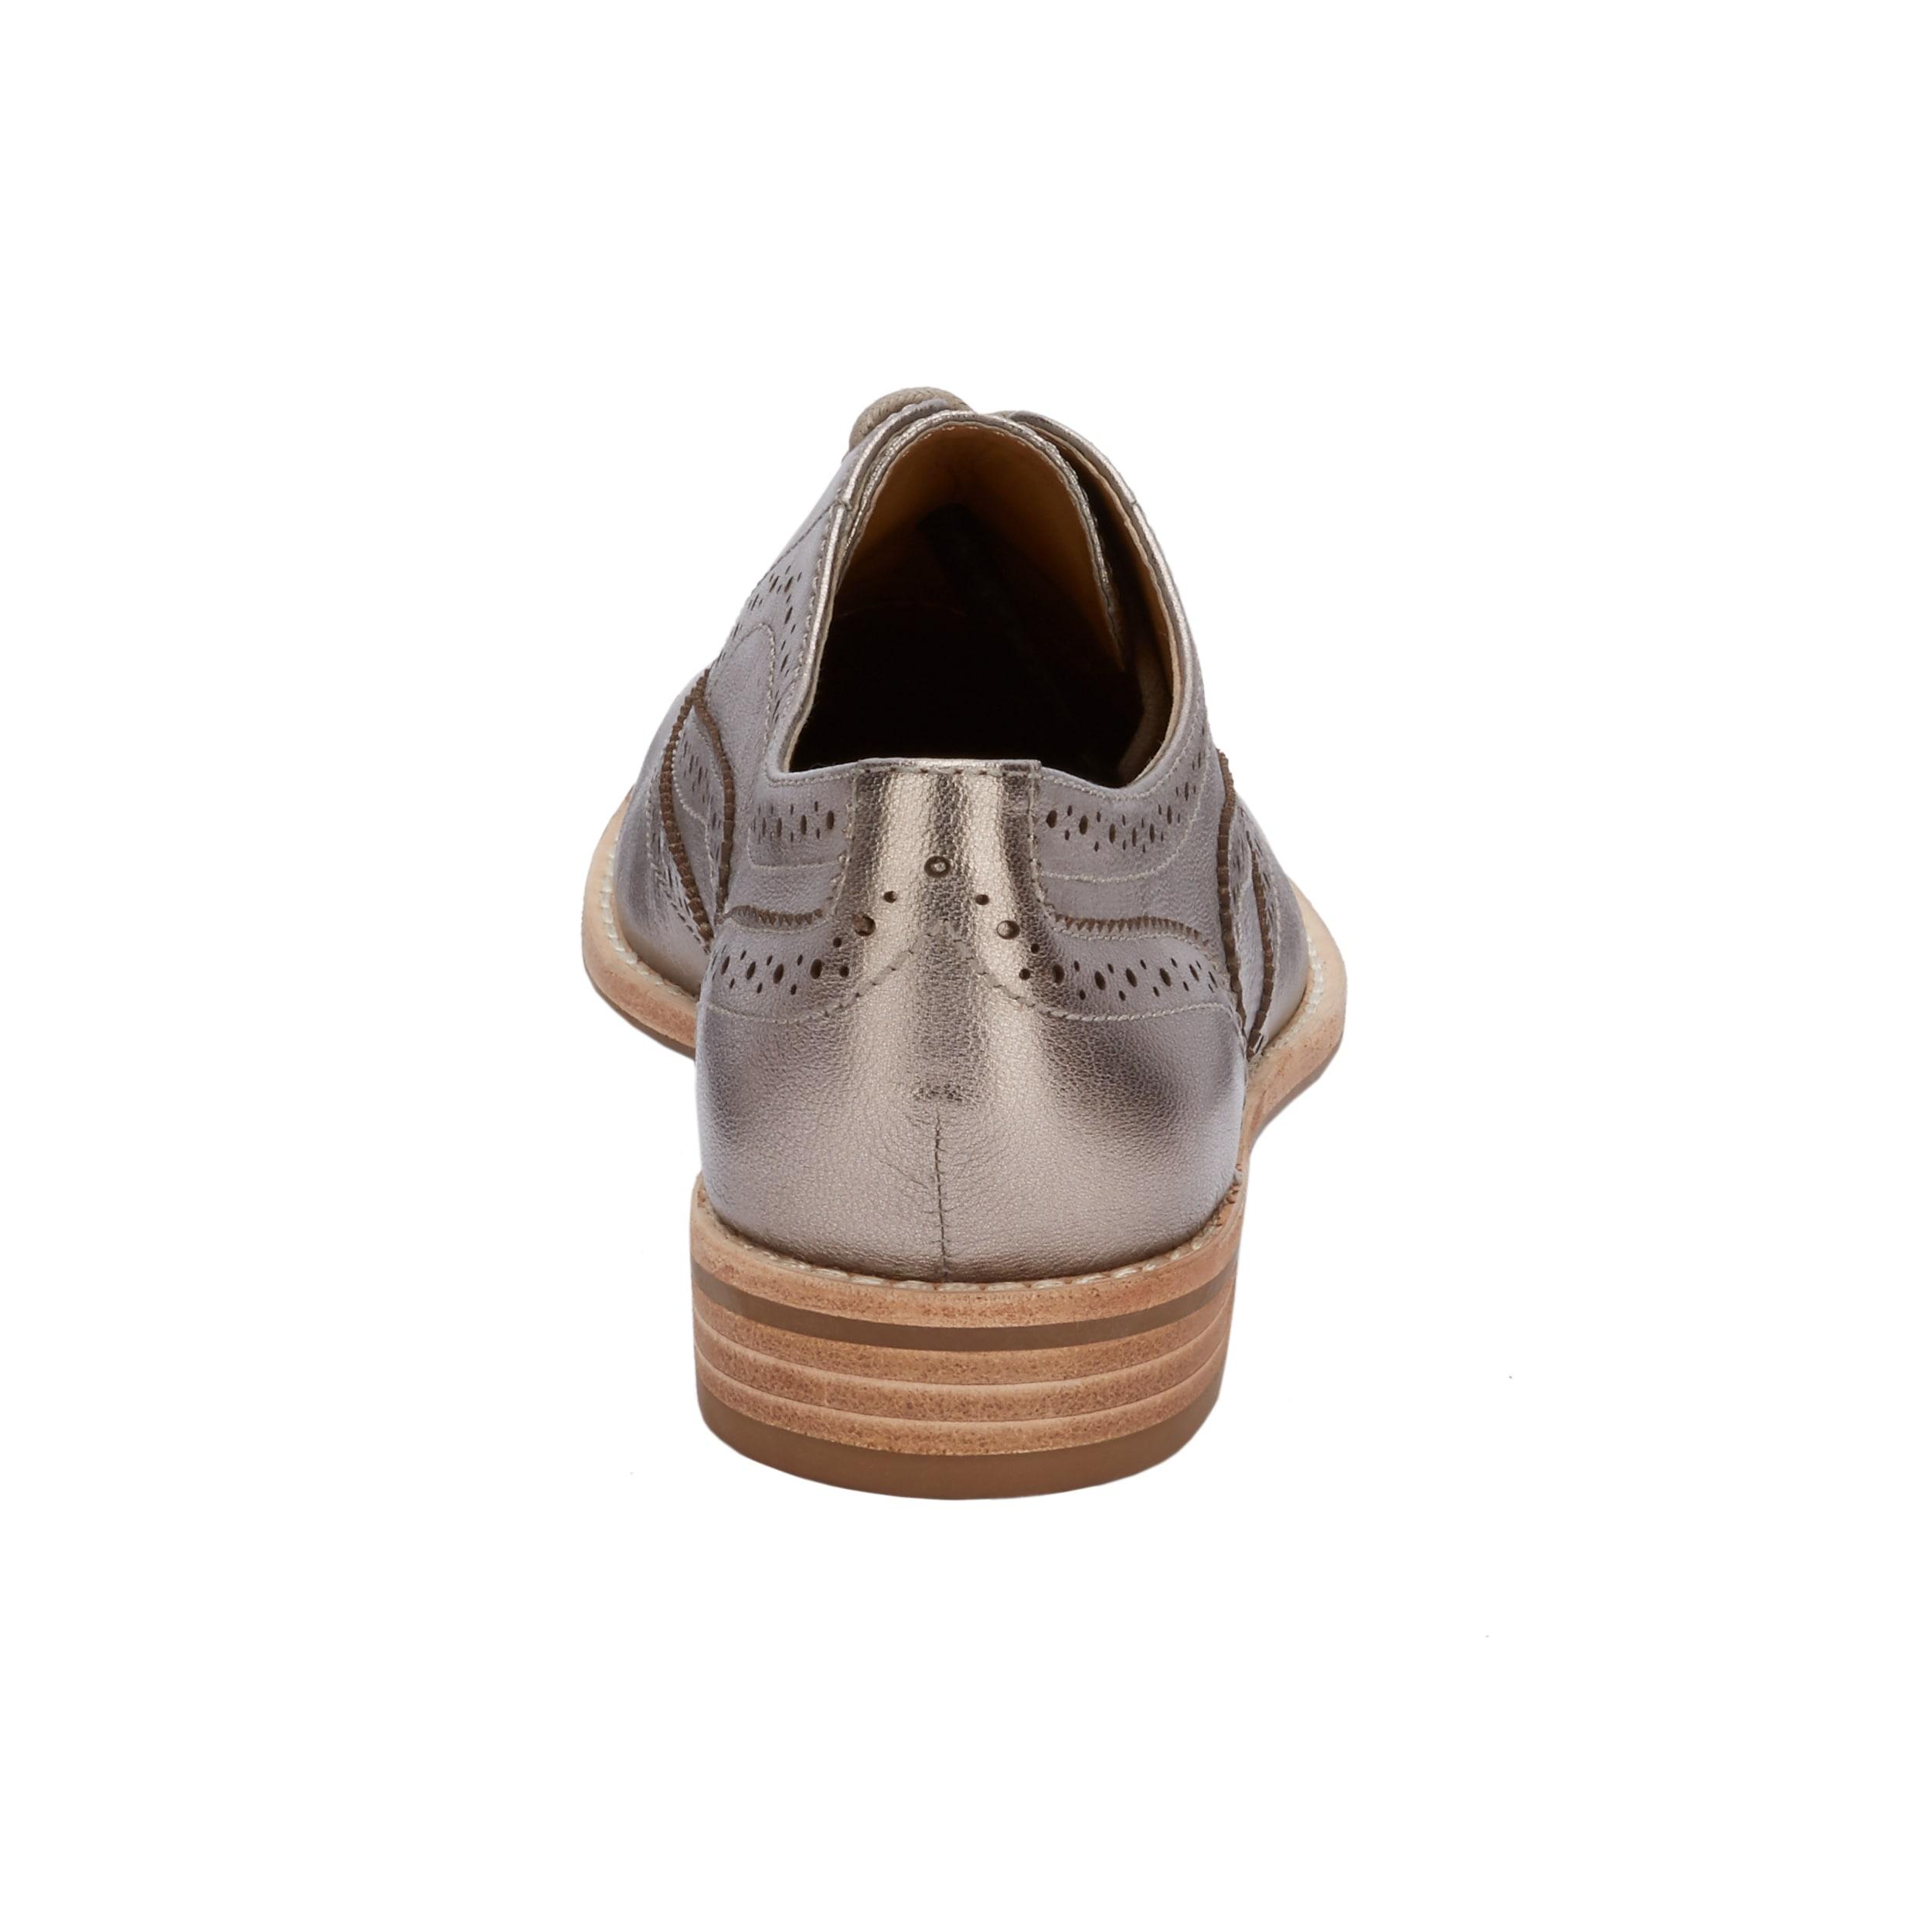 8cf4a0c5ffd08 G.H. Bass & Co. Womens Erica Leather Wingtip Oxford Shoe